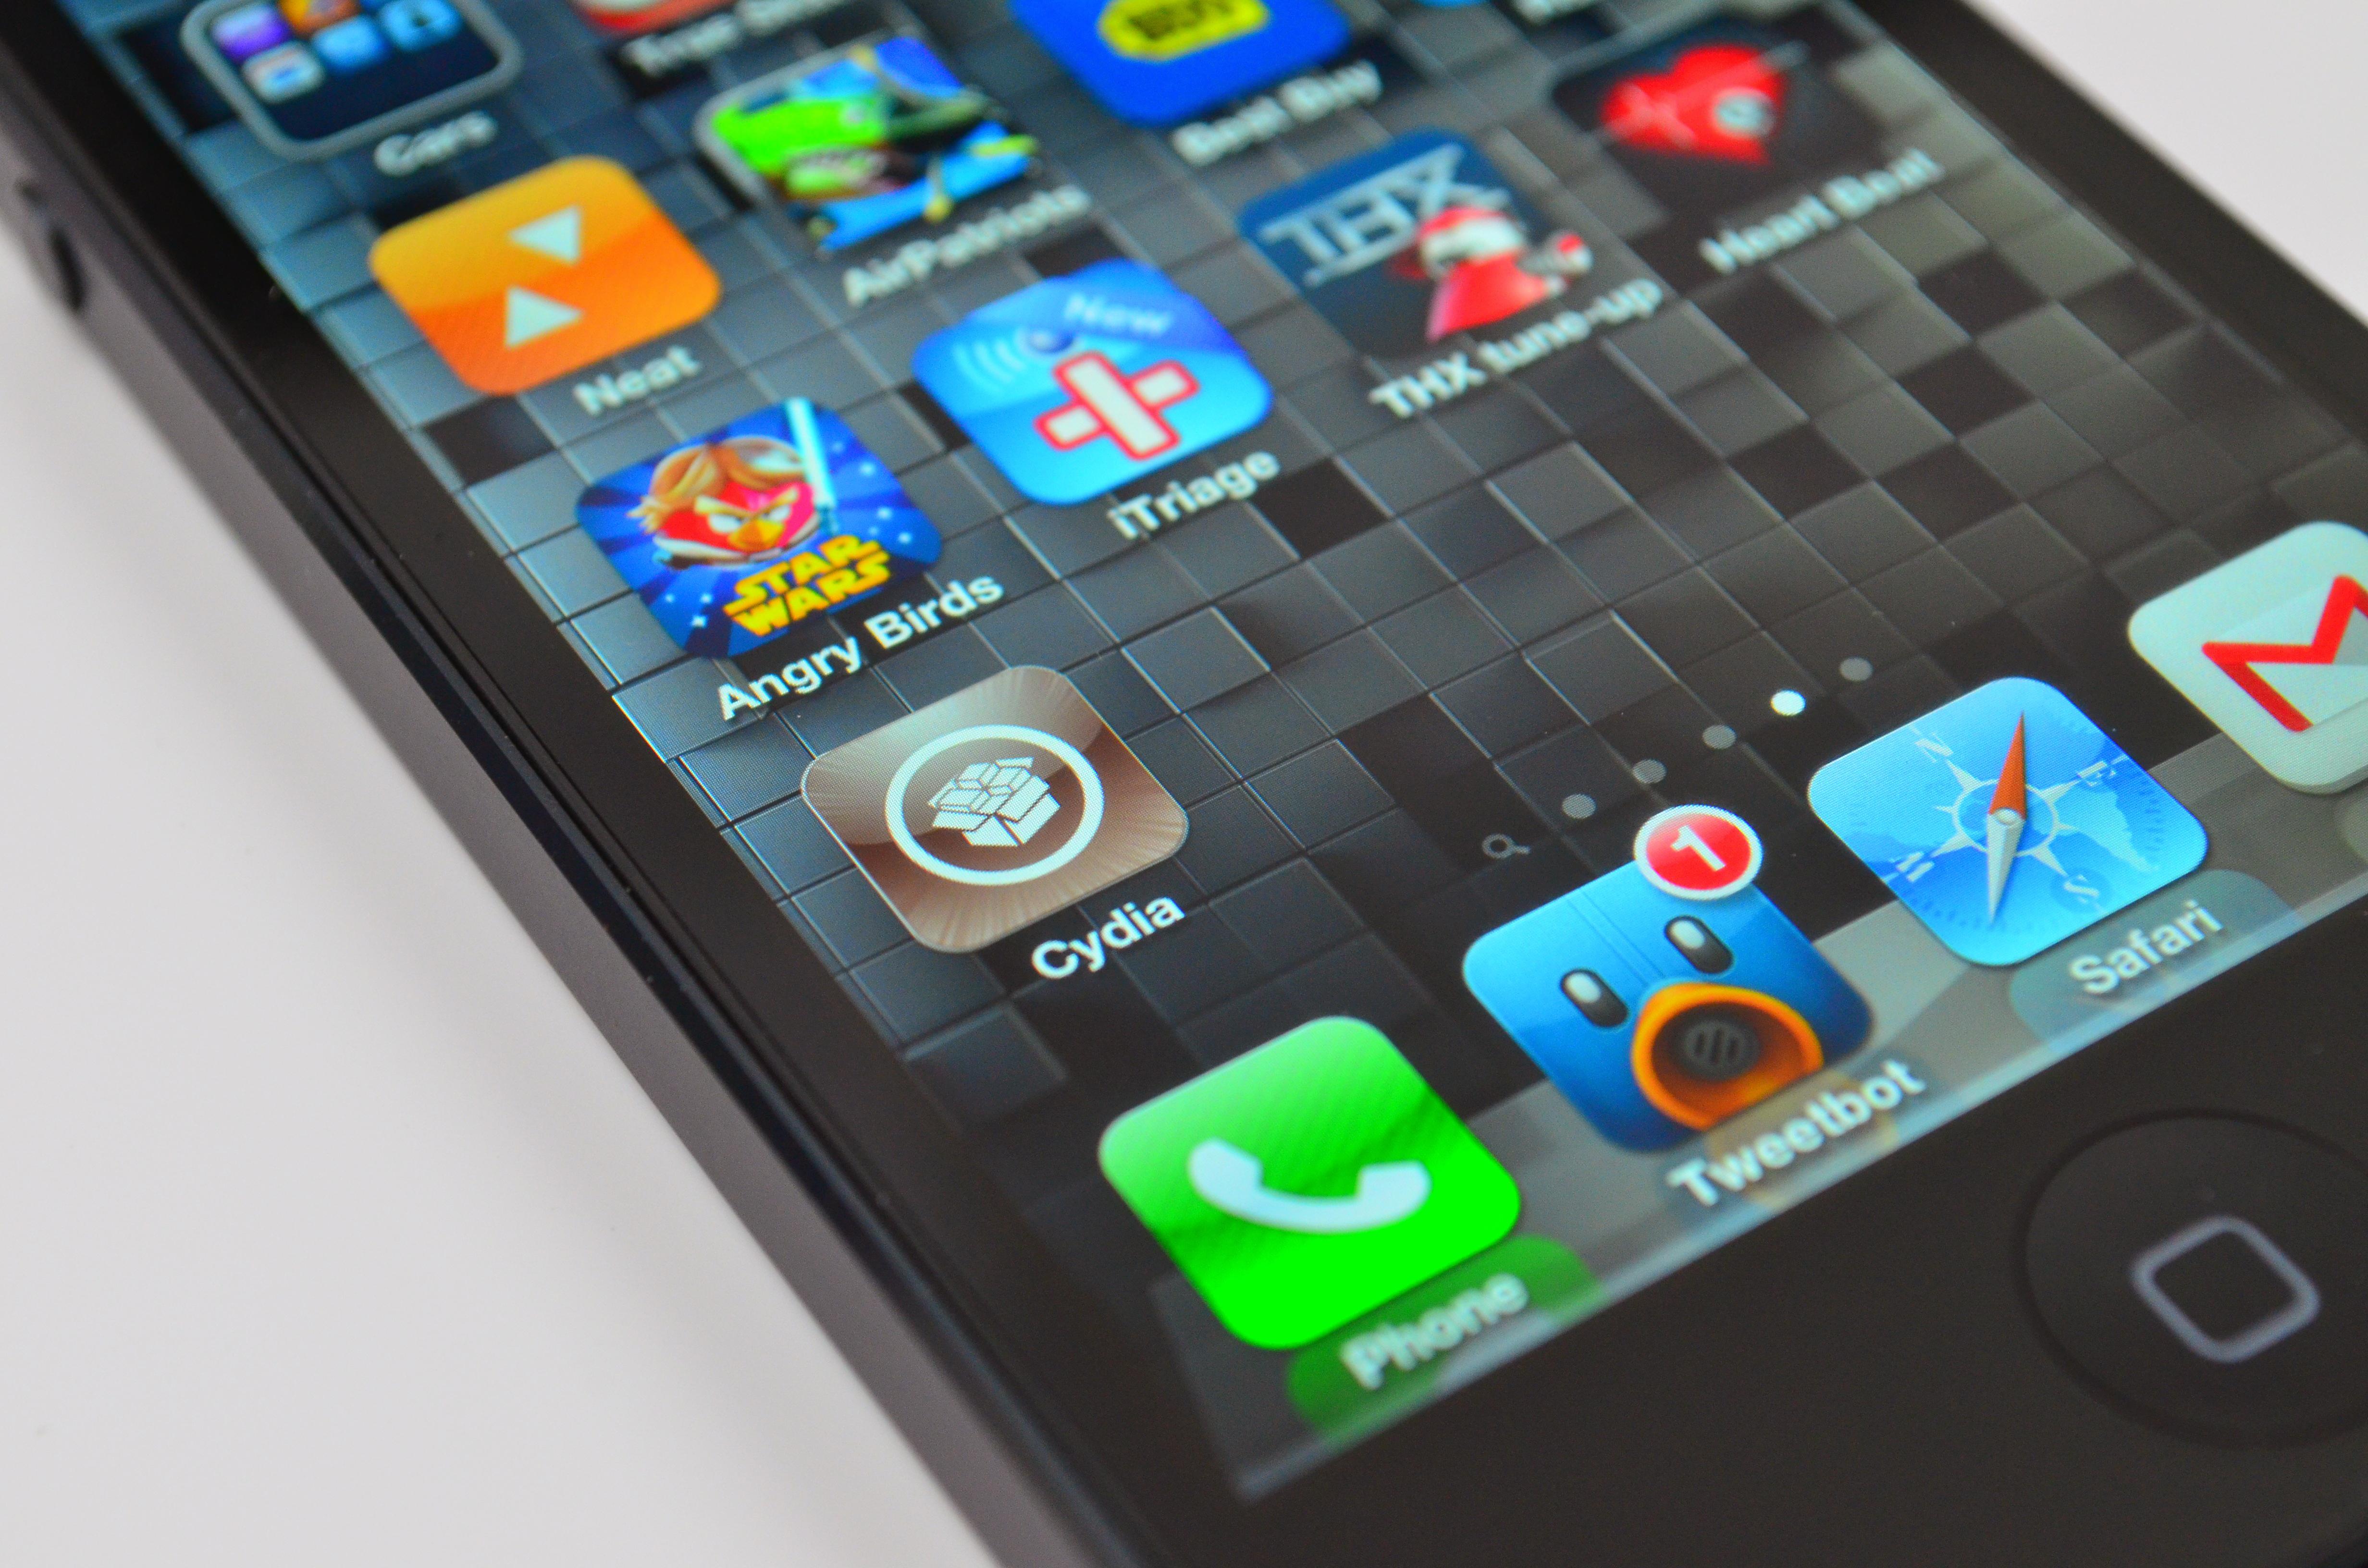 Непривязанный джейлбрейк iOS 6.0 6.1 (iPhone 5, iPad mini, iPad 4